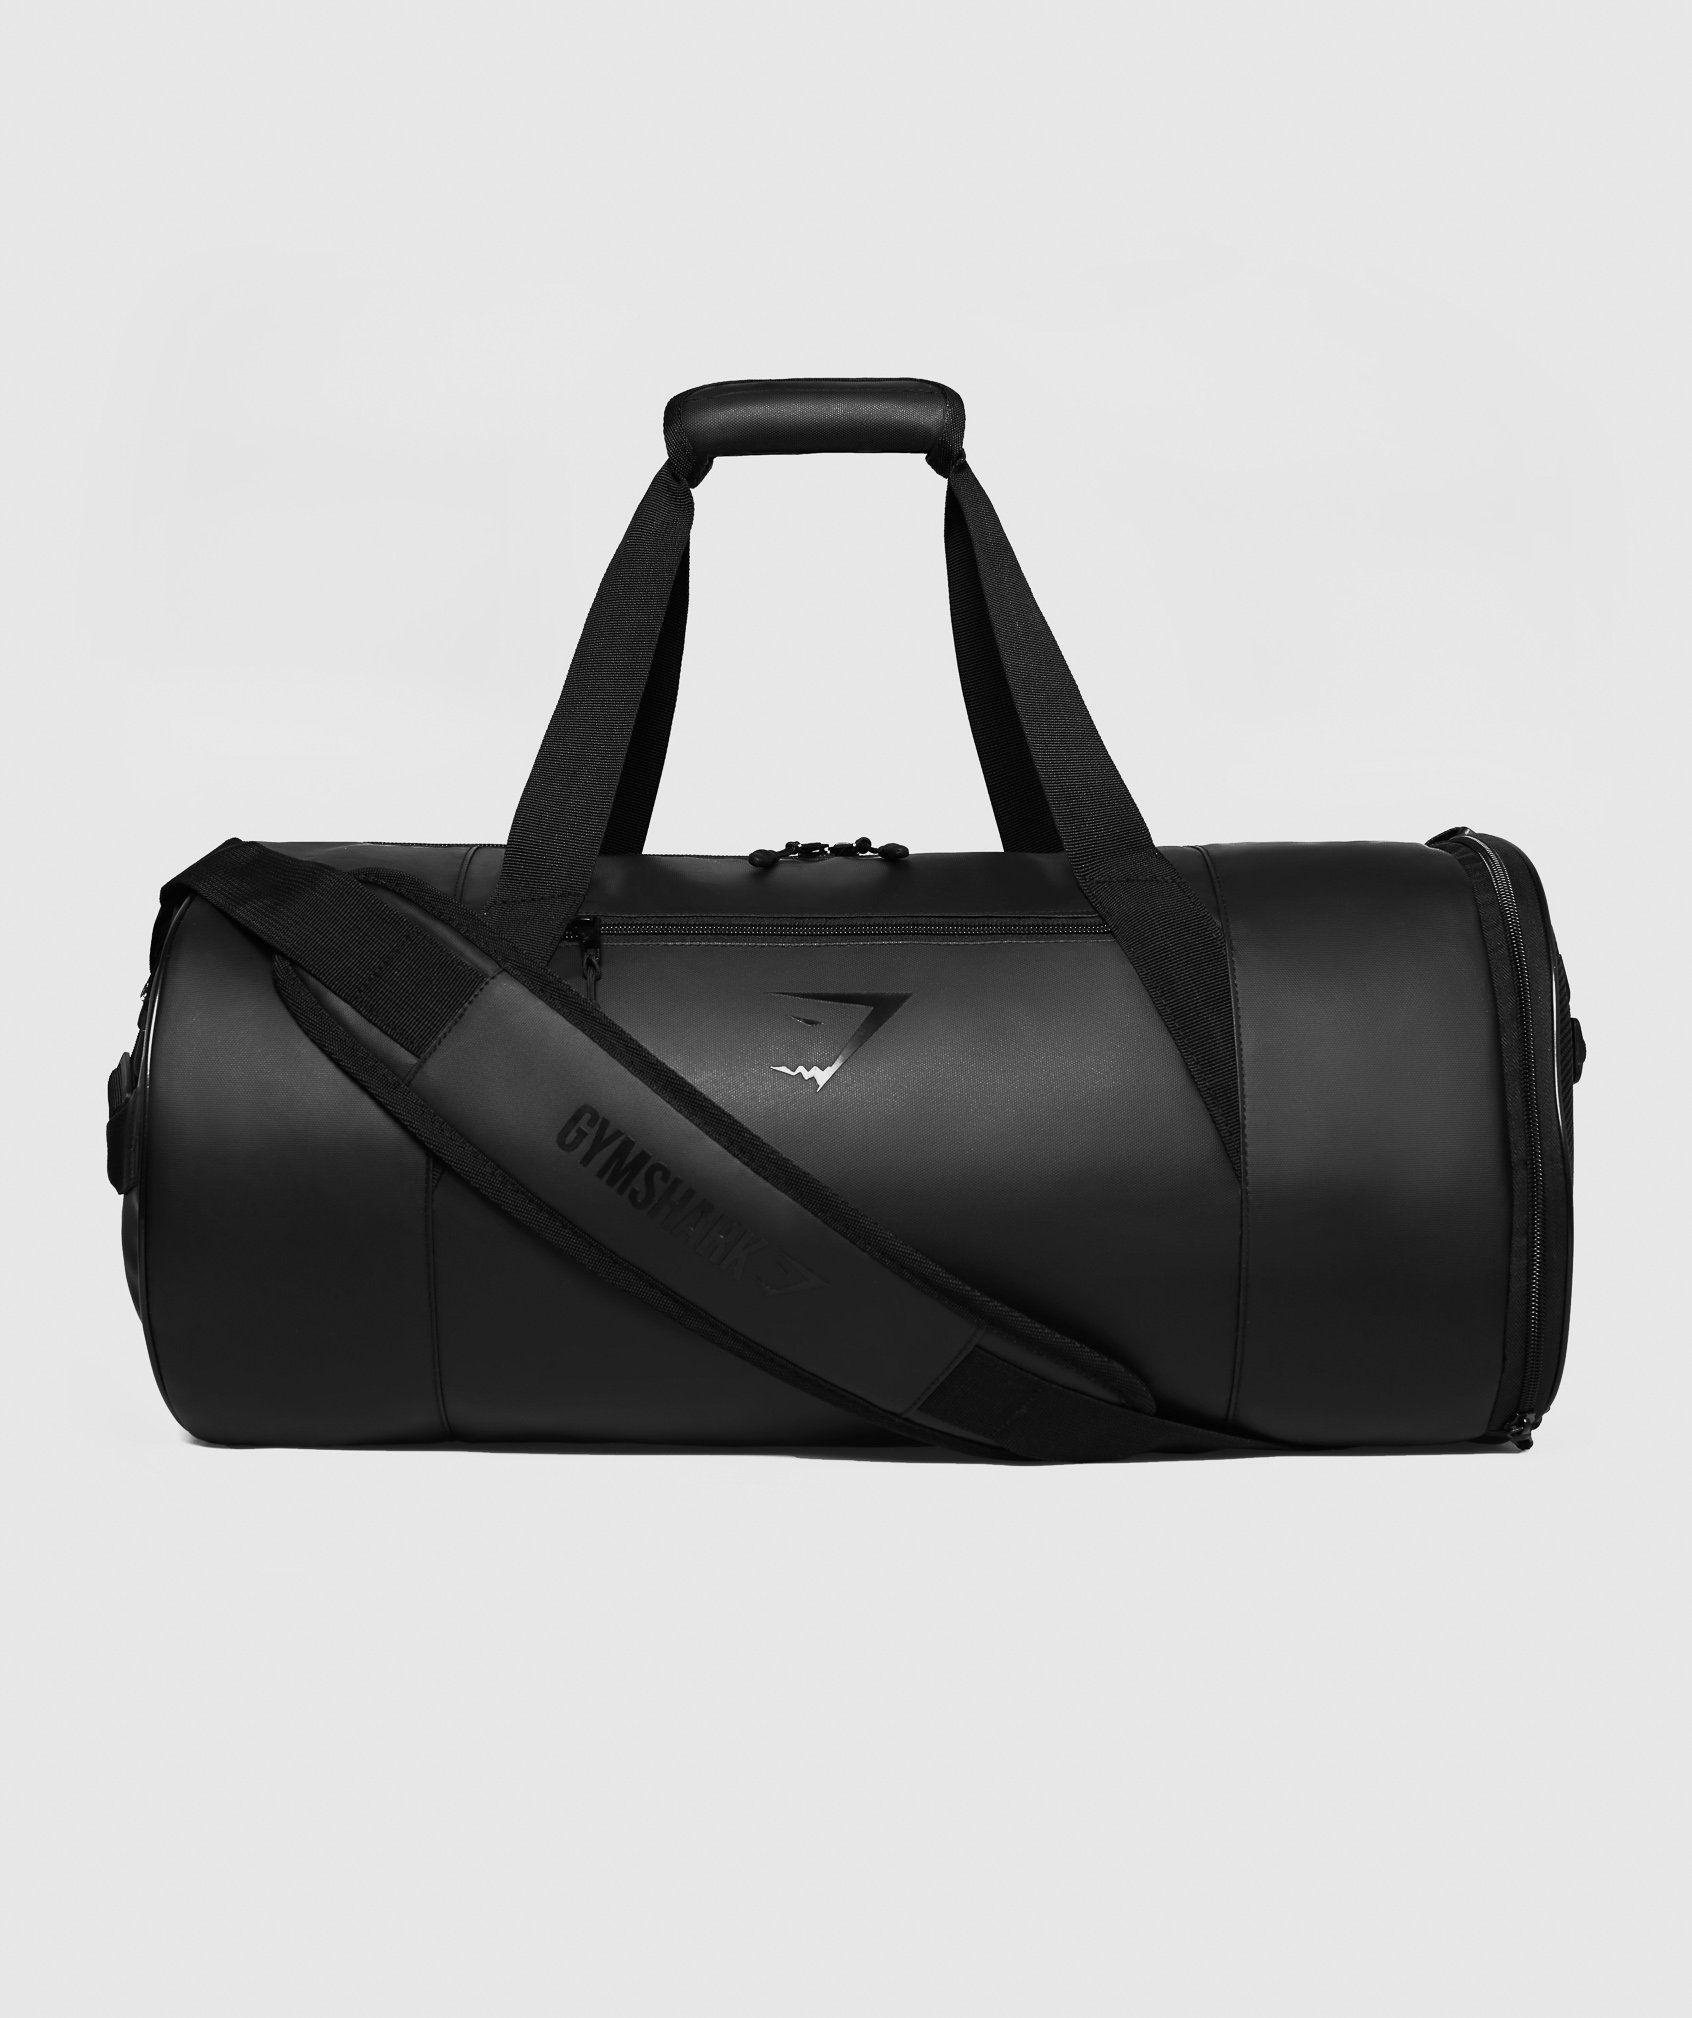 ADGAI French Bulldog Birthday Party Canvas Travel Weekender Bag,Fashion Custom Lightweight Large Capacity Portable Luggage Bag,Suitcase Trolley Bag